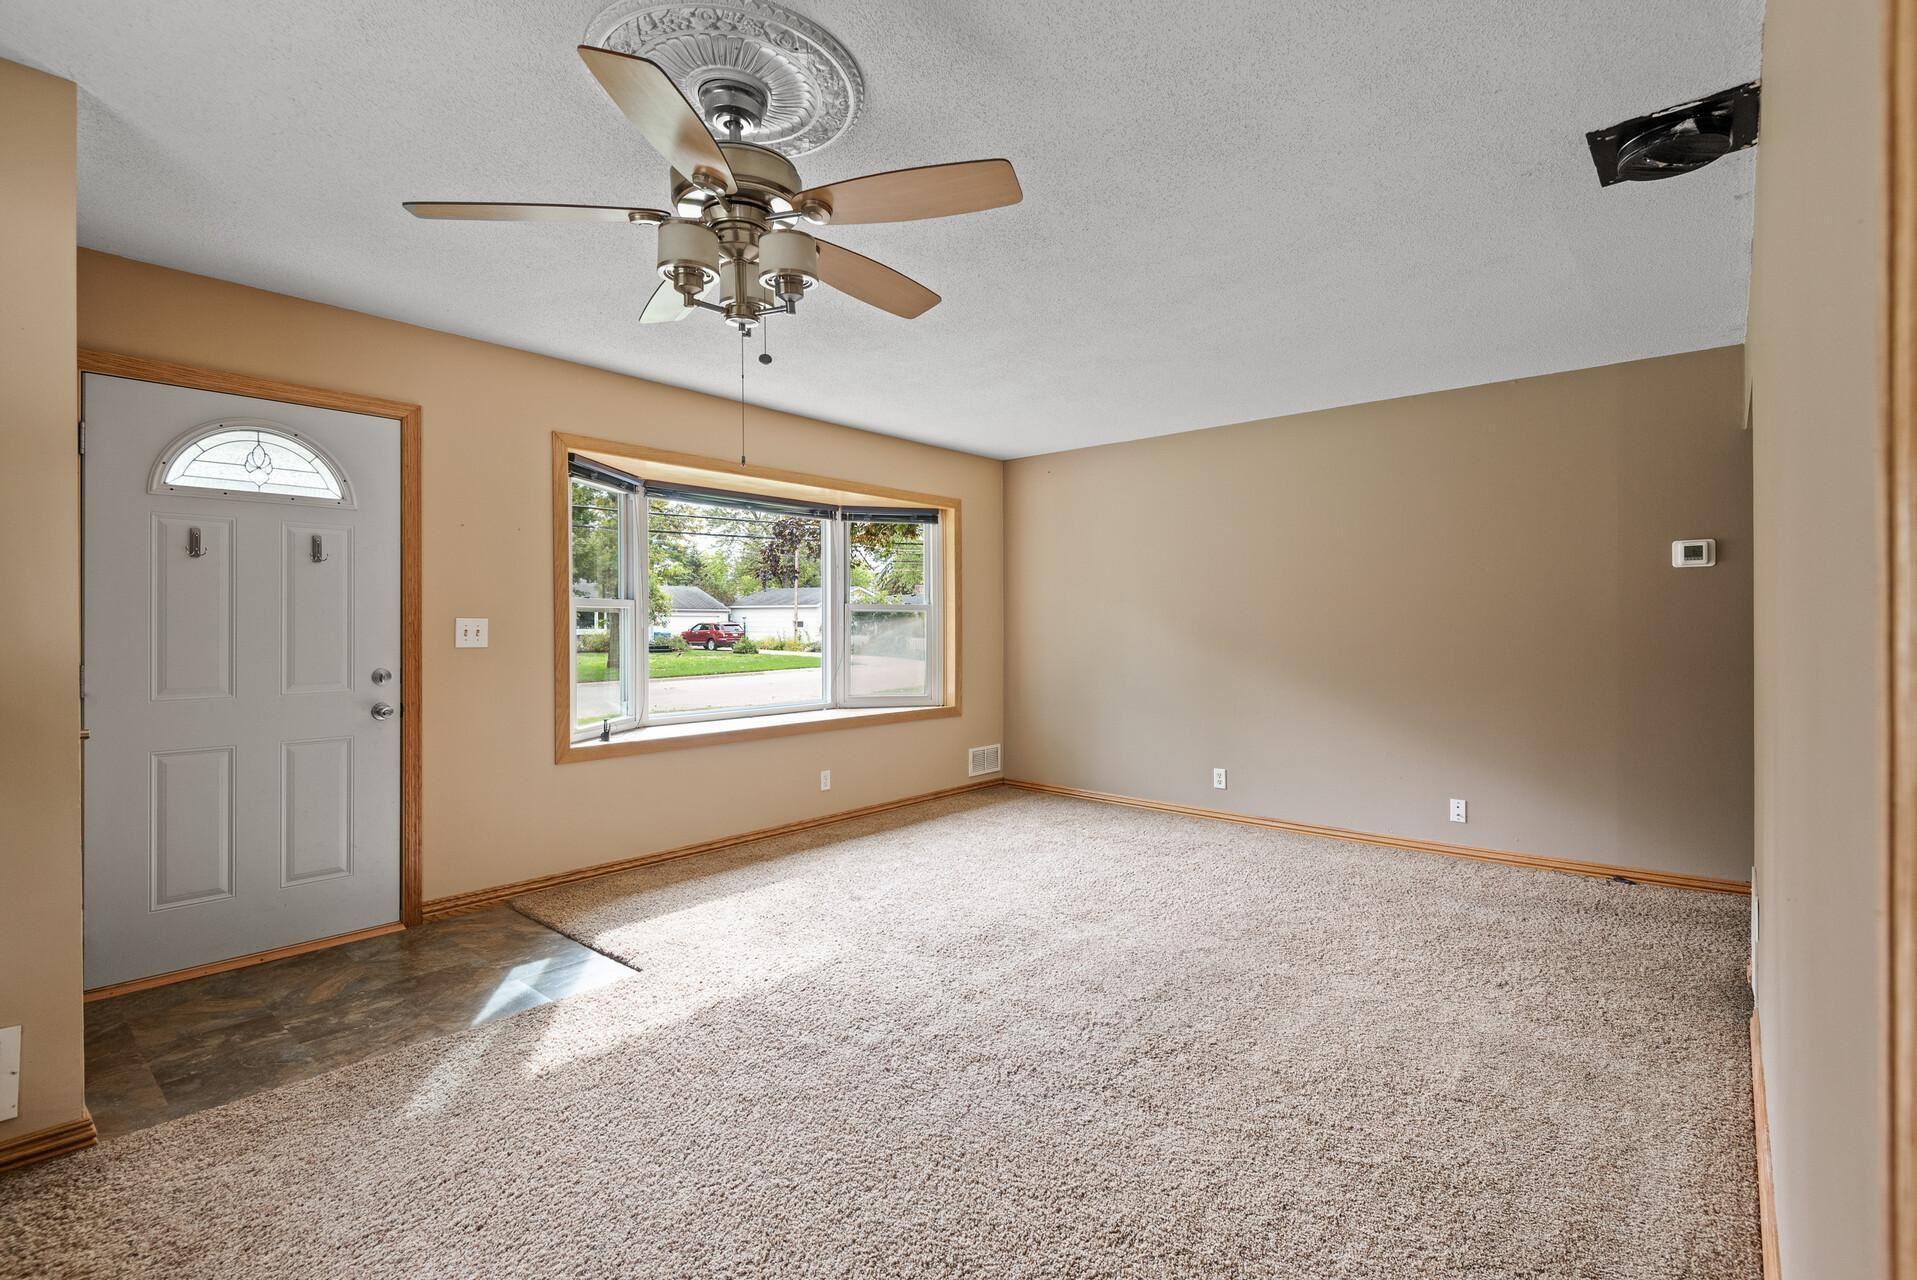 Photo of 10140 Pleasant Avenue S, Bloomington, MN 55420 (MLS # 6102094)